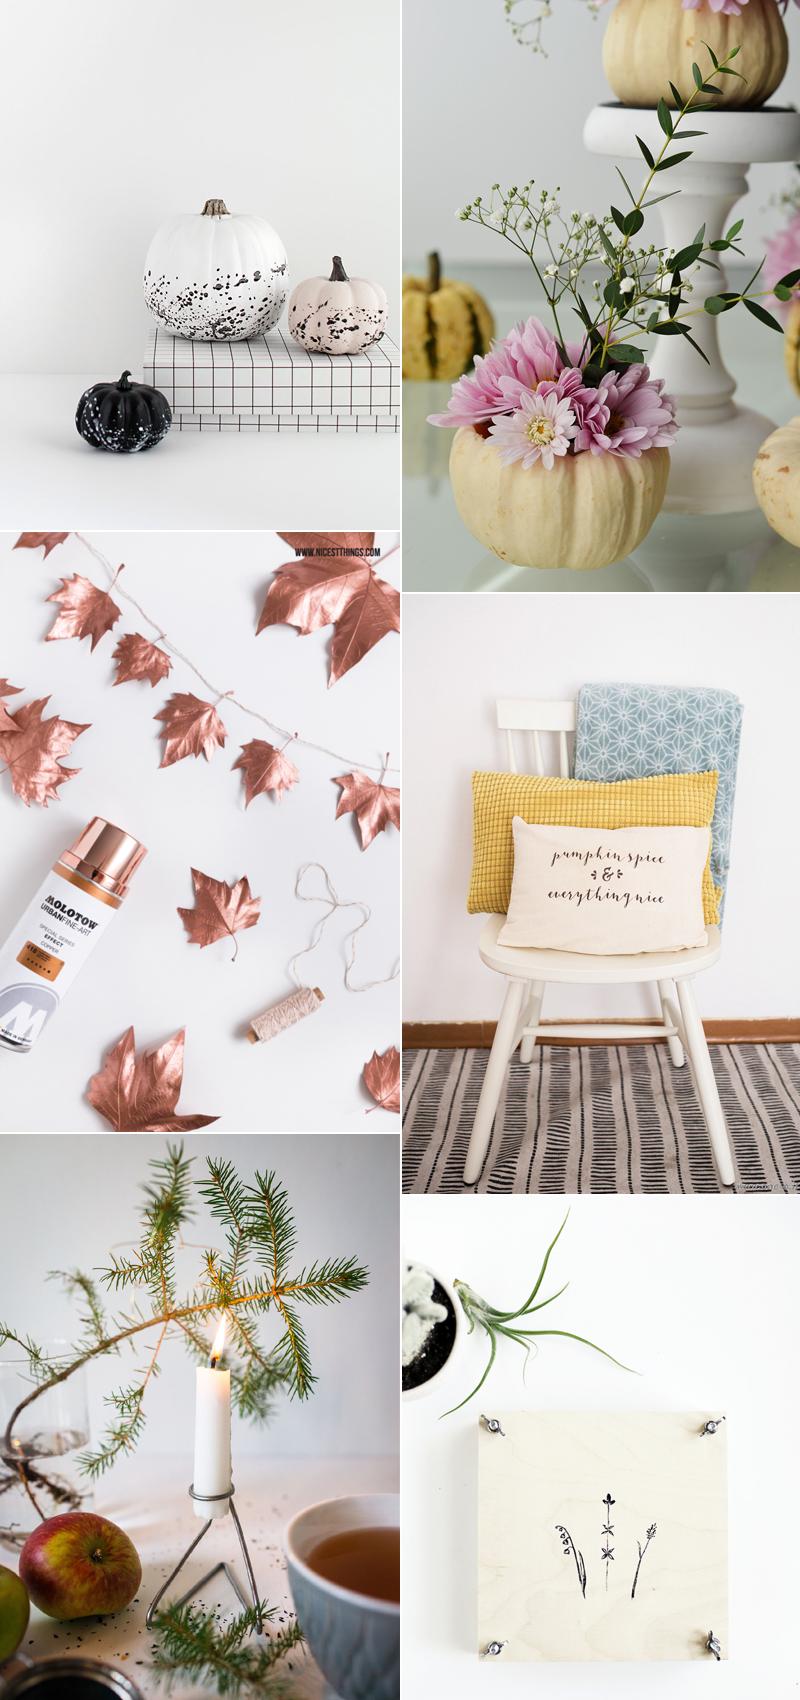 herbst diy inspiration | we love handmade